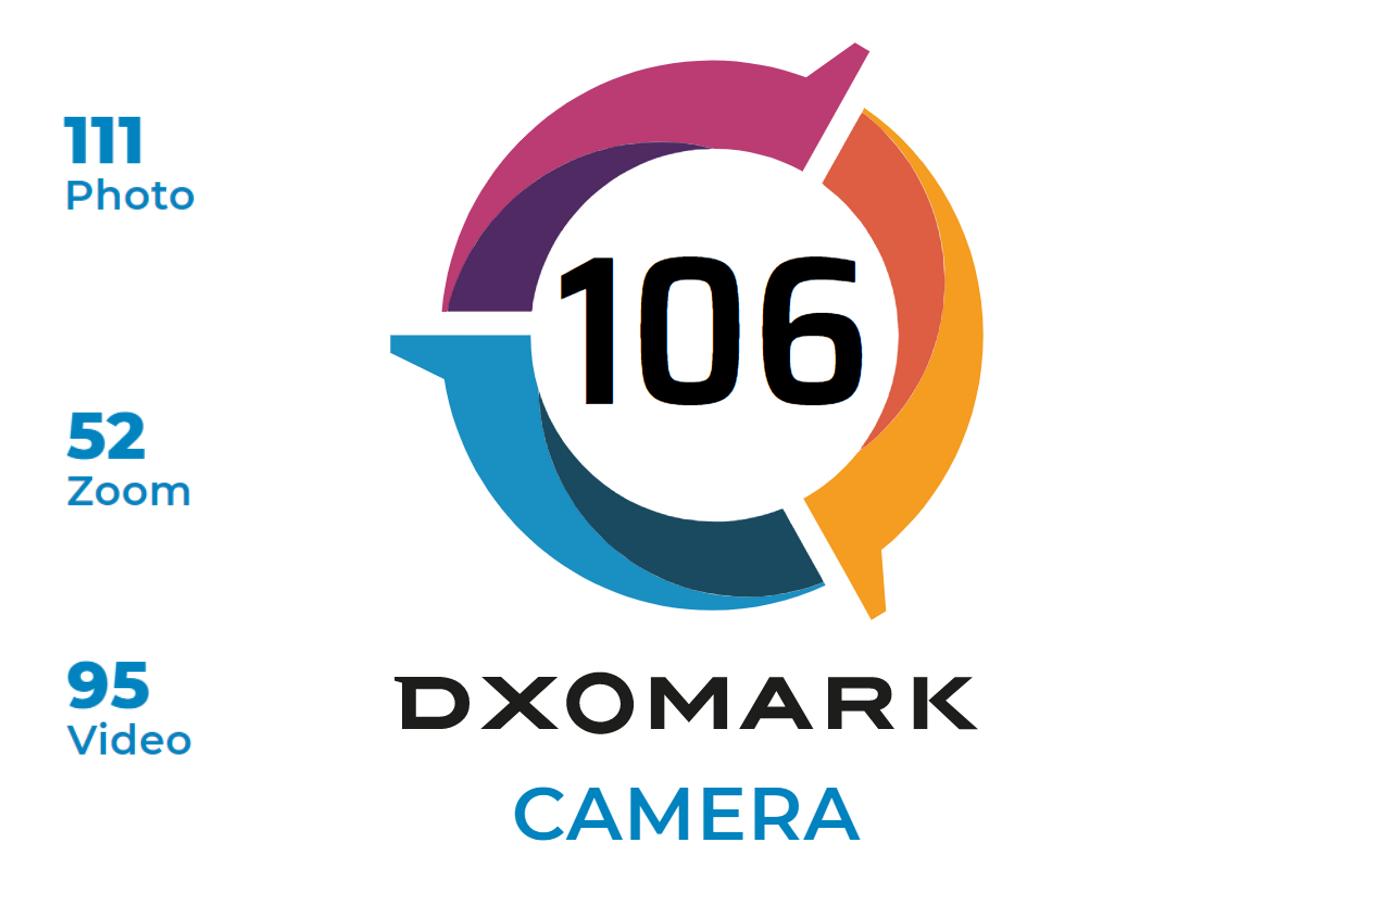 Dxomark Protestirovalo Kameru Redmi Note 10 Pro 2